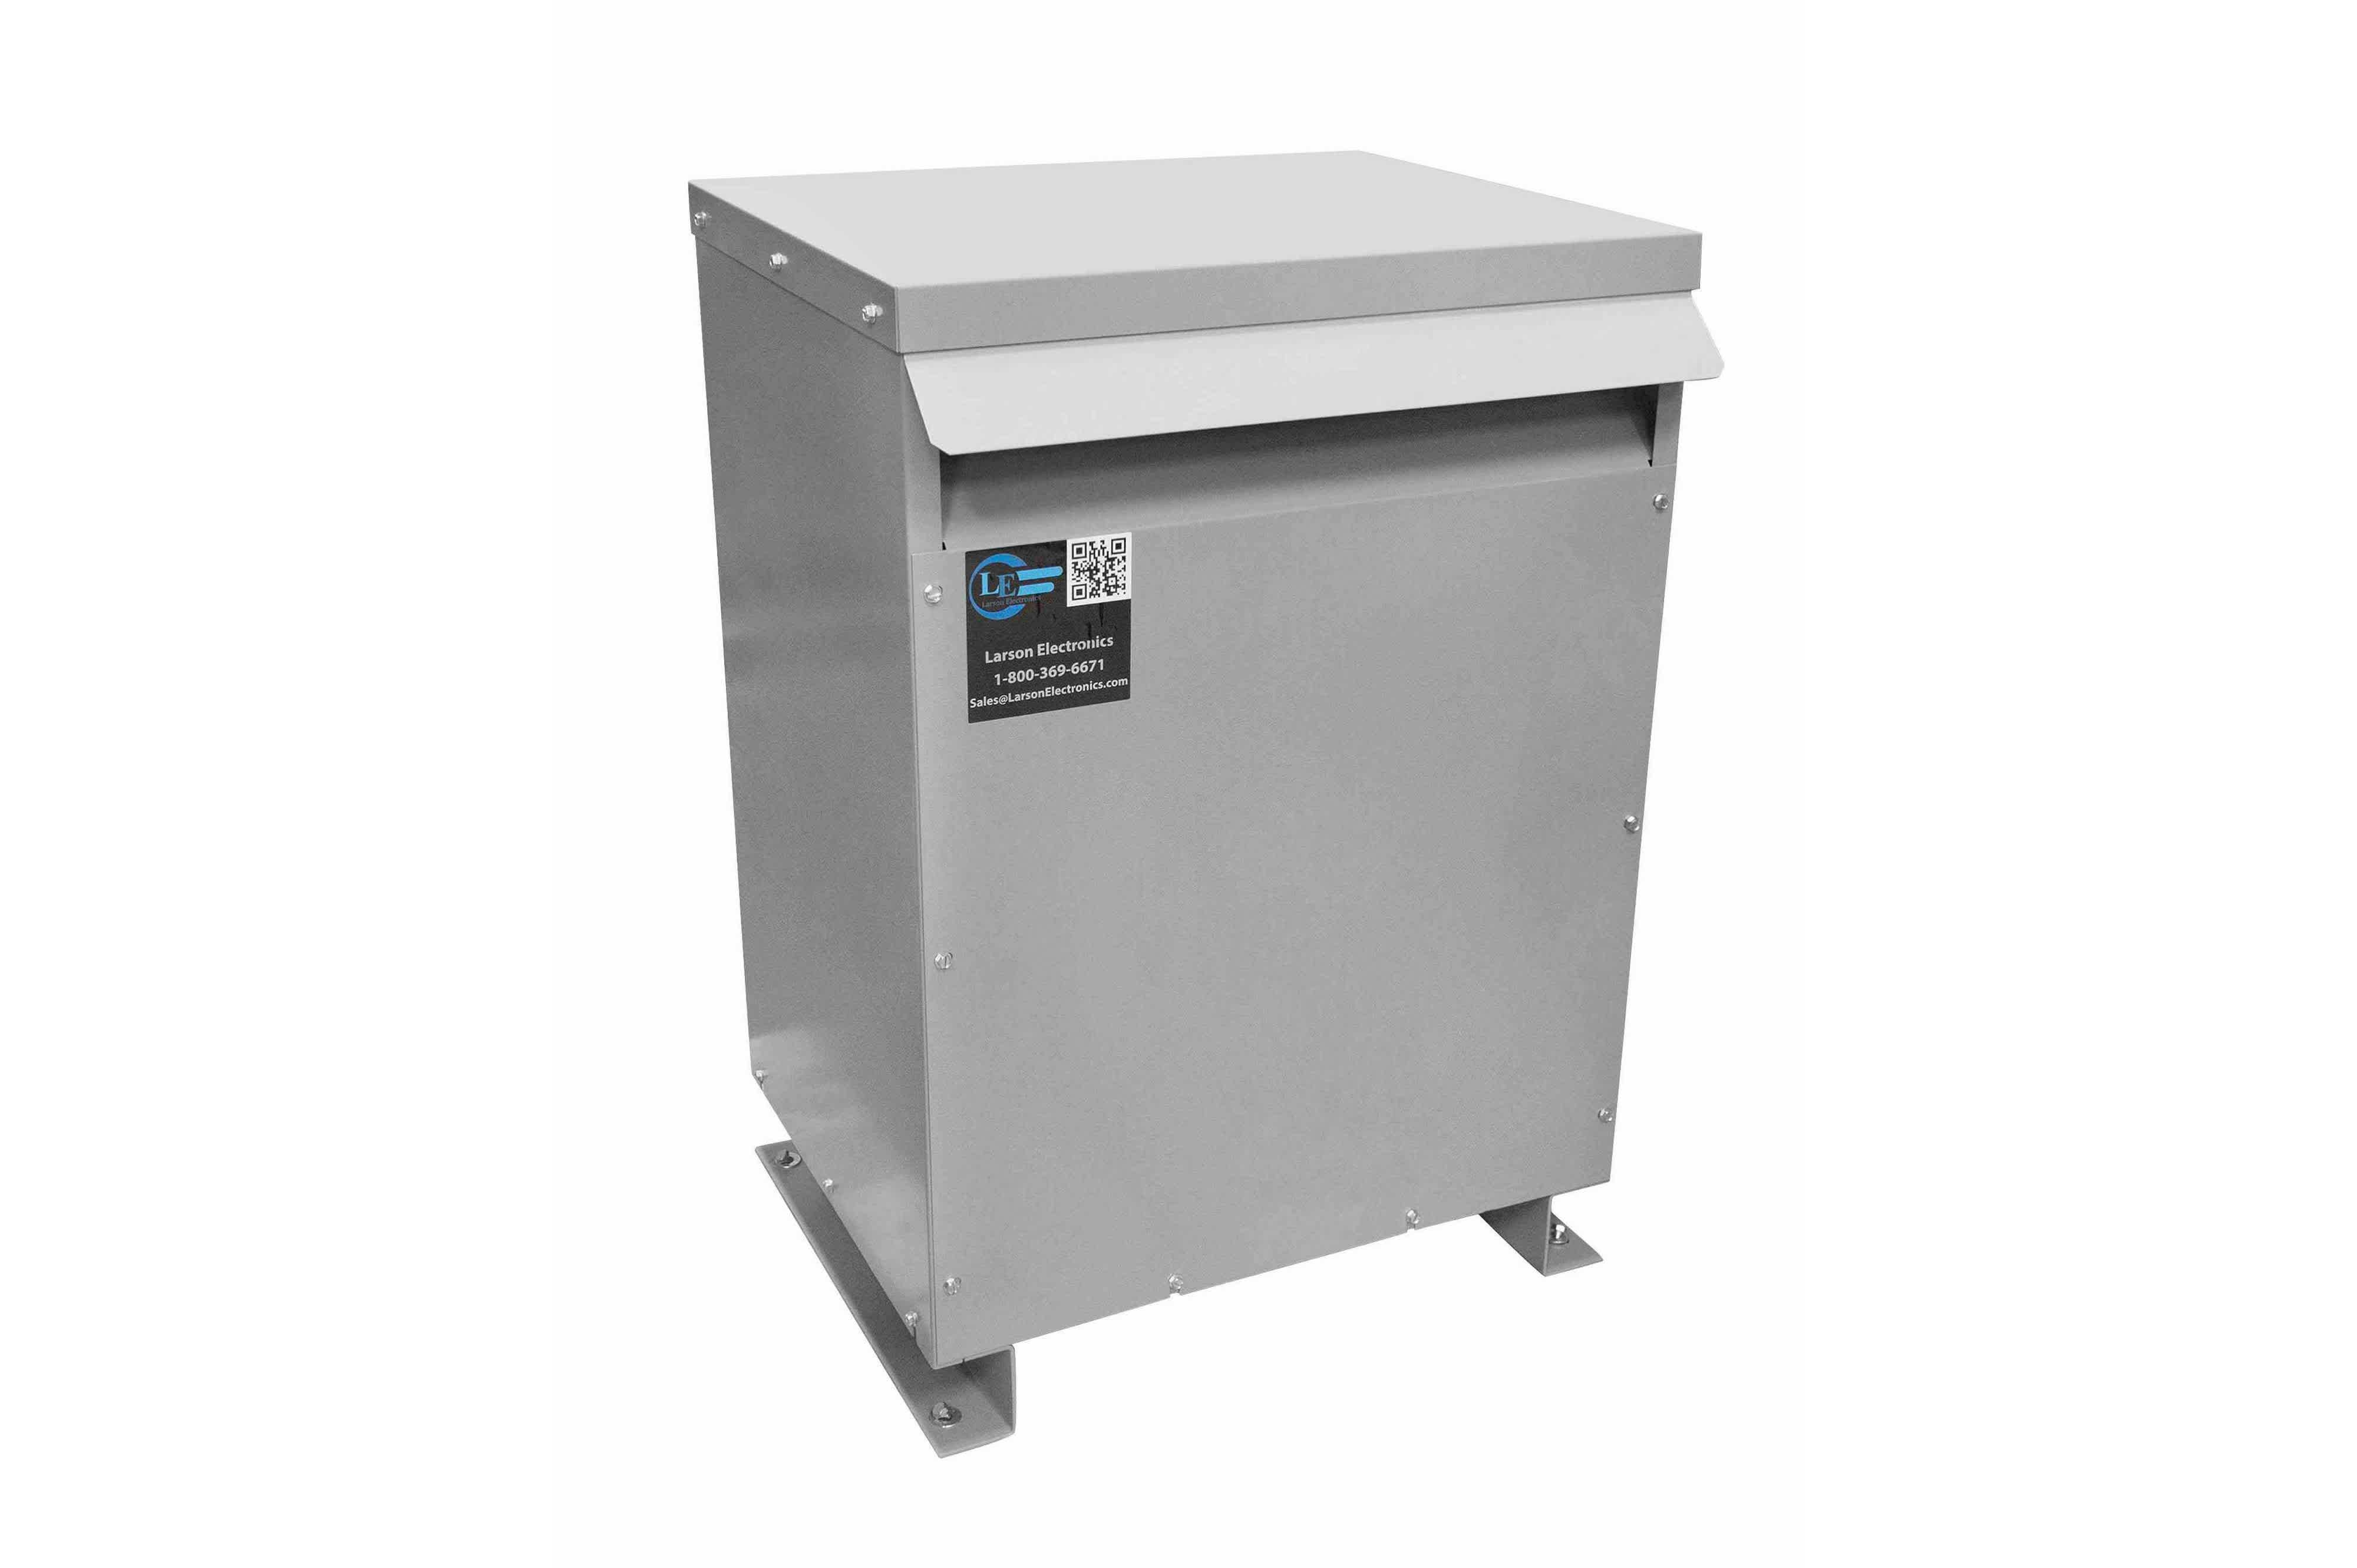 225 kVA 3PH DOE Transformer, 460V Delta Primary, 575Y/332 Wye-N Secondary, N3R, Ventilated, 60 Hz